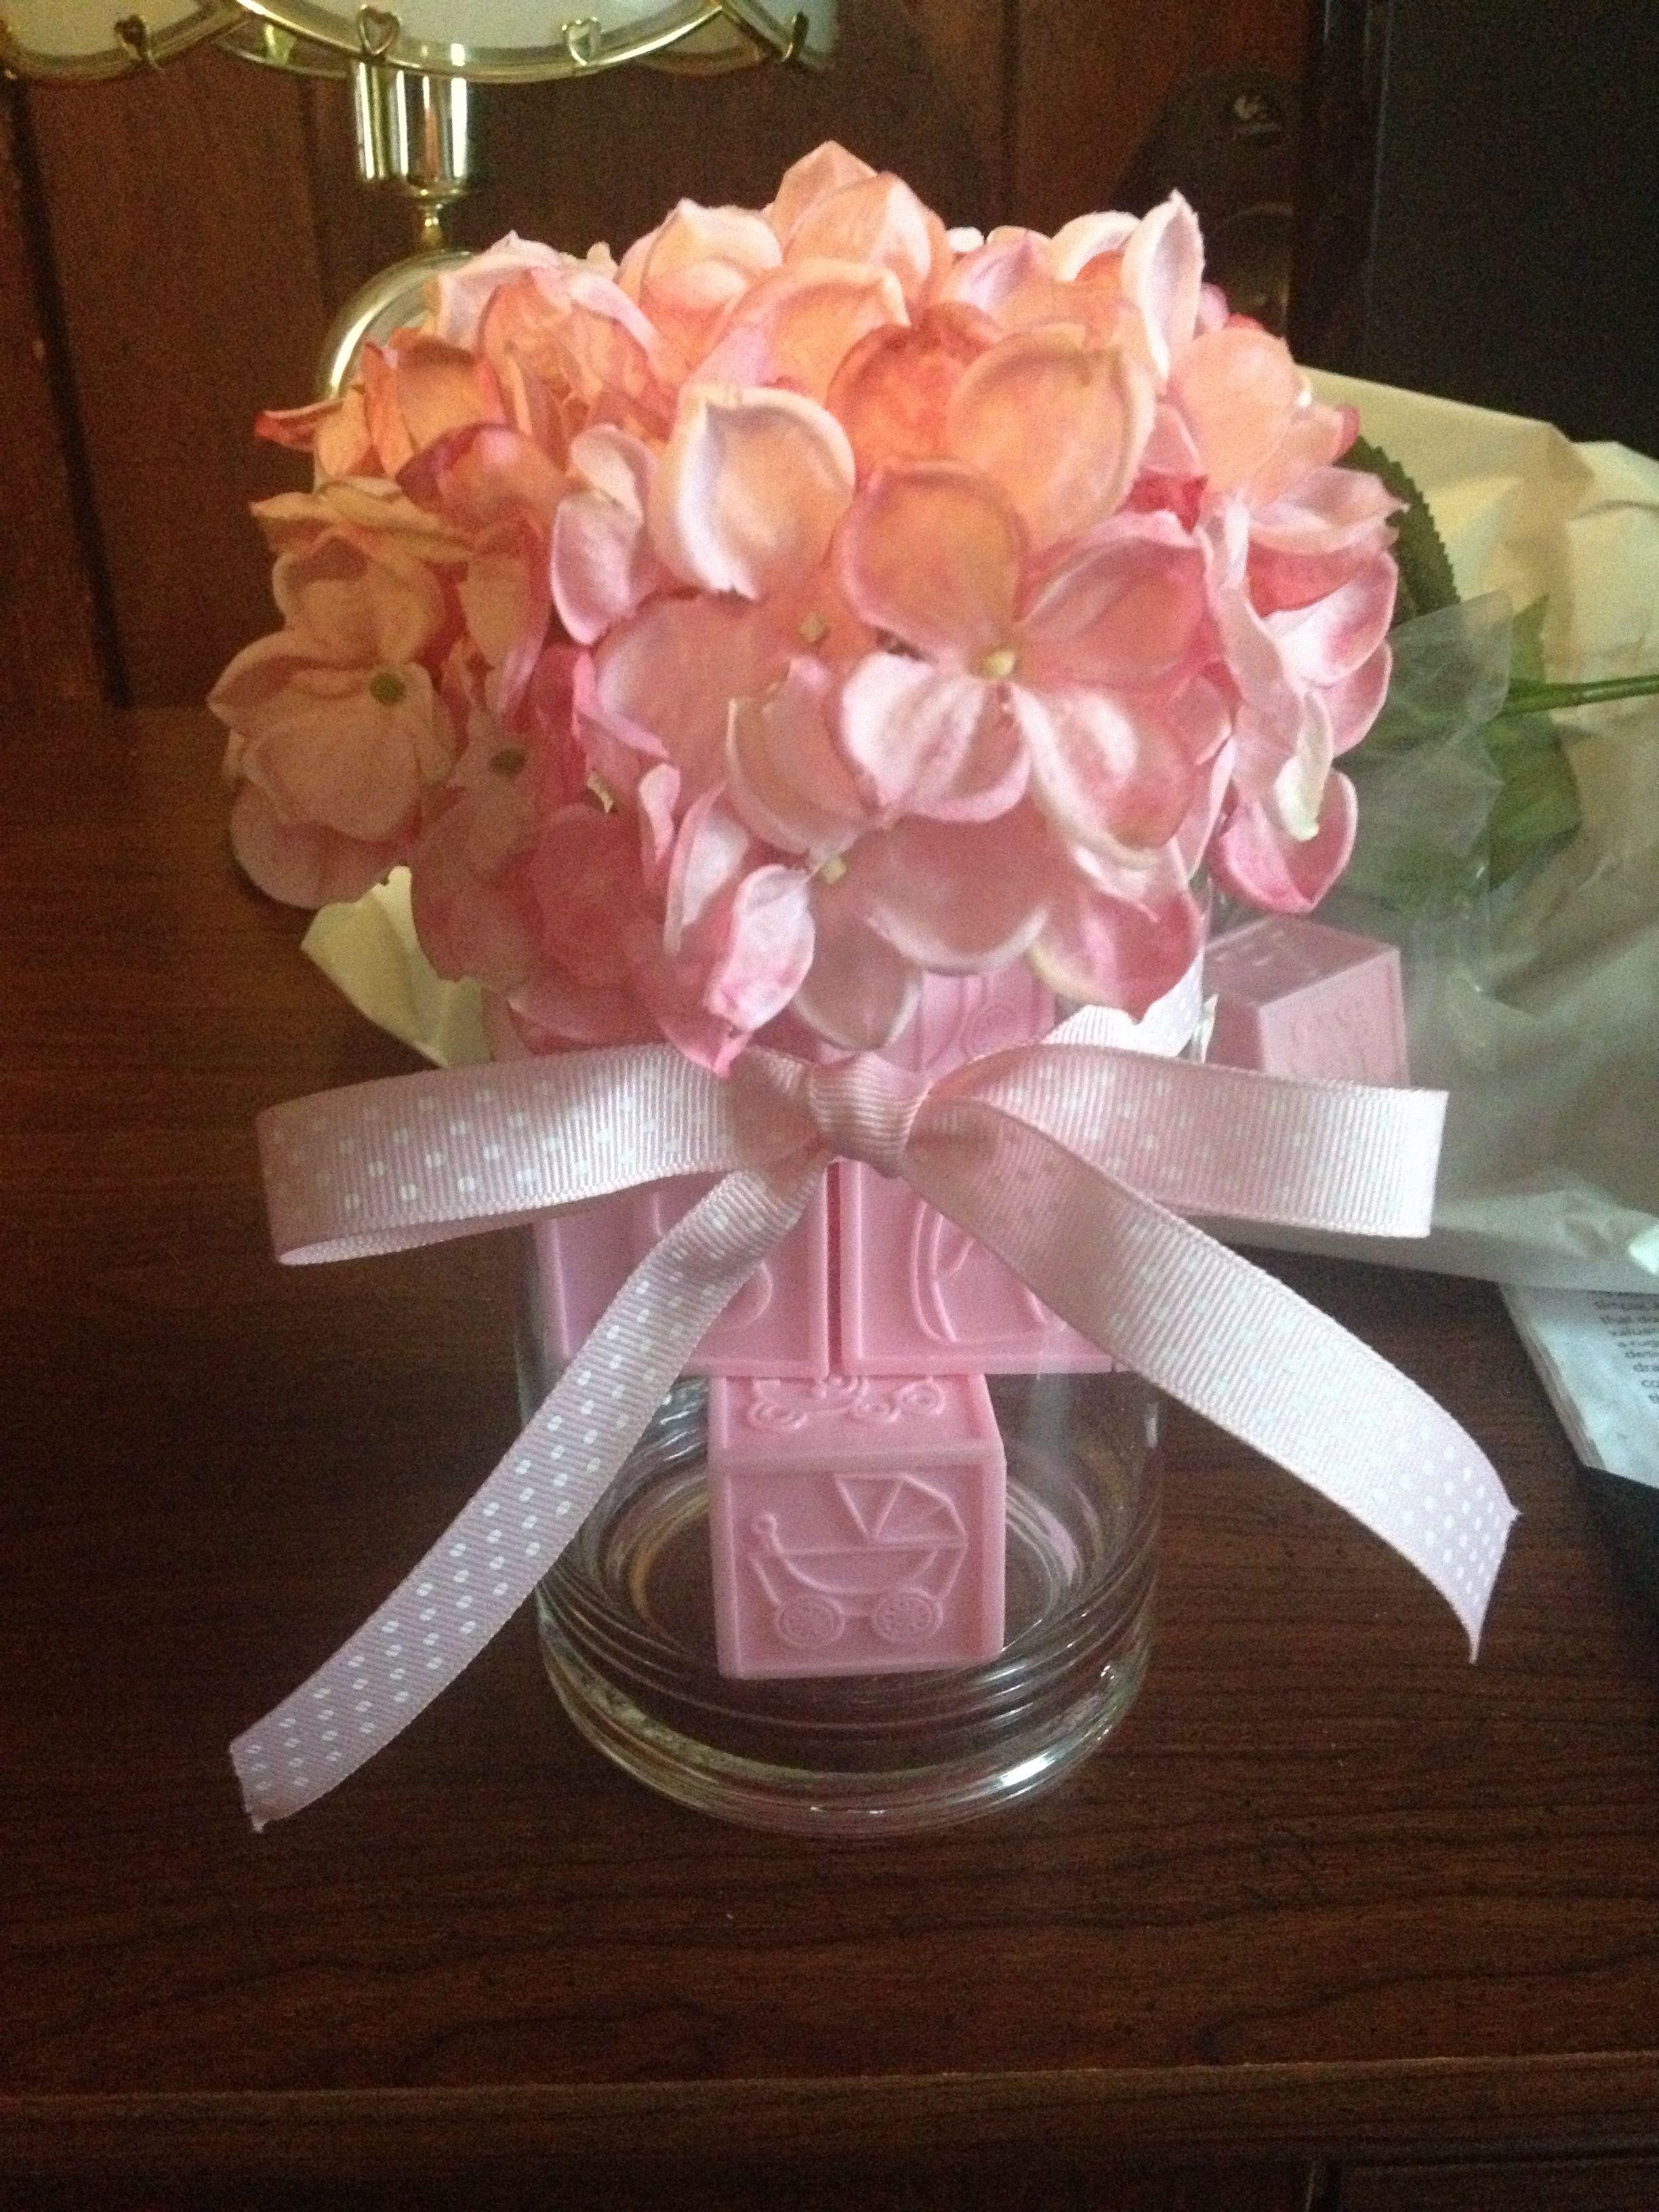 Girl baby shower decoration could use fake flowers cheaper could use fake flowers cheaper minus the baby blocks tacky izmirmasajfo